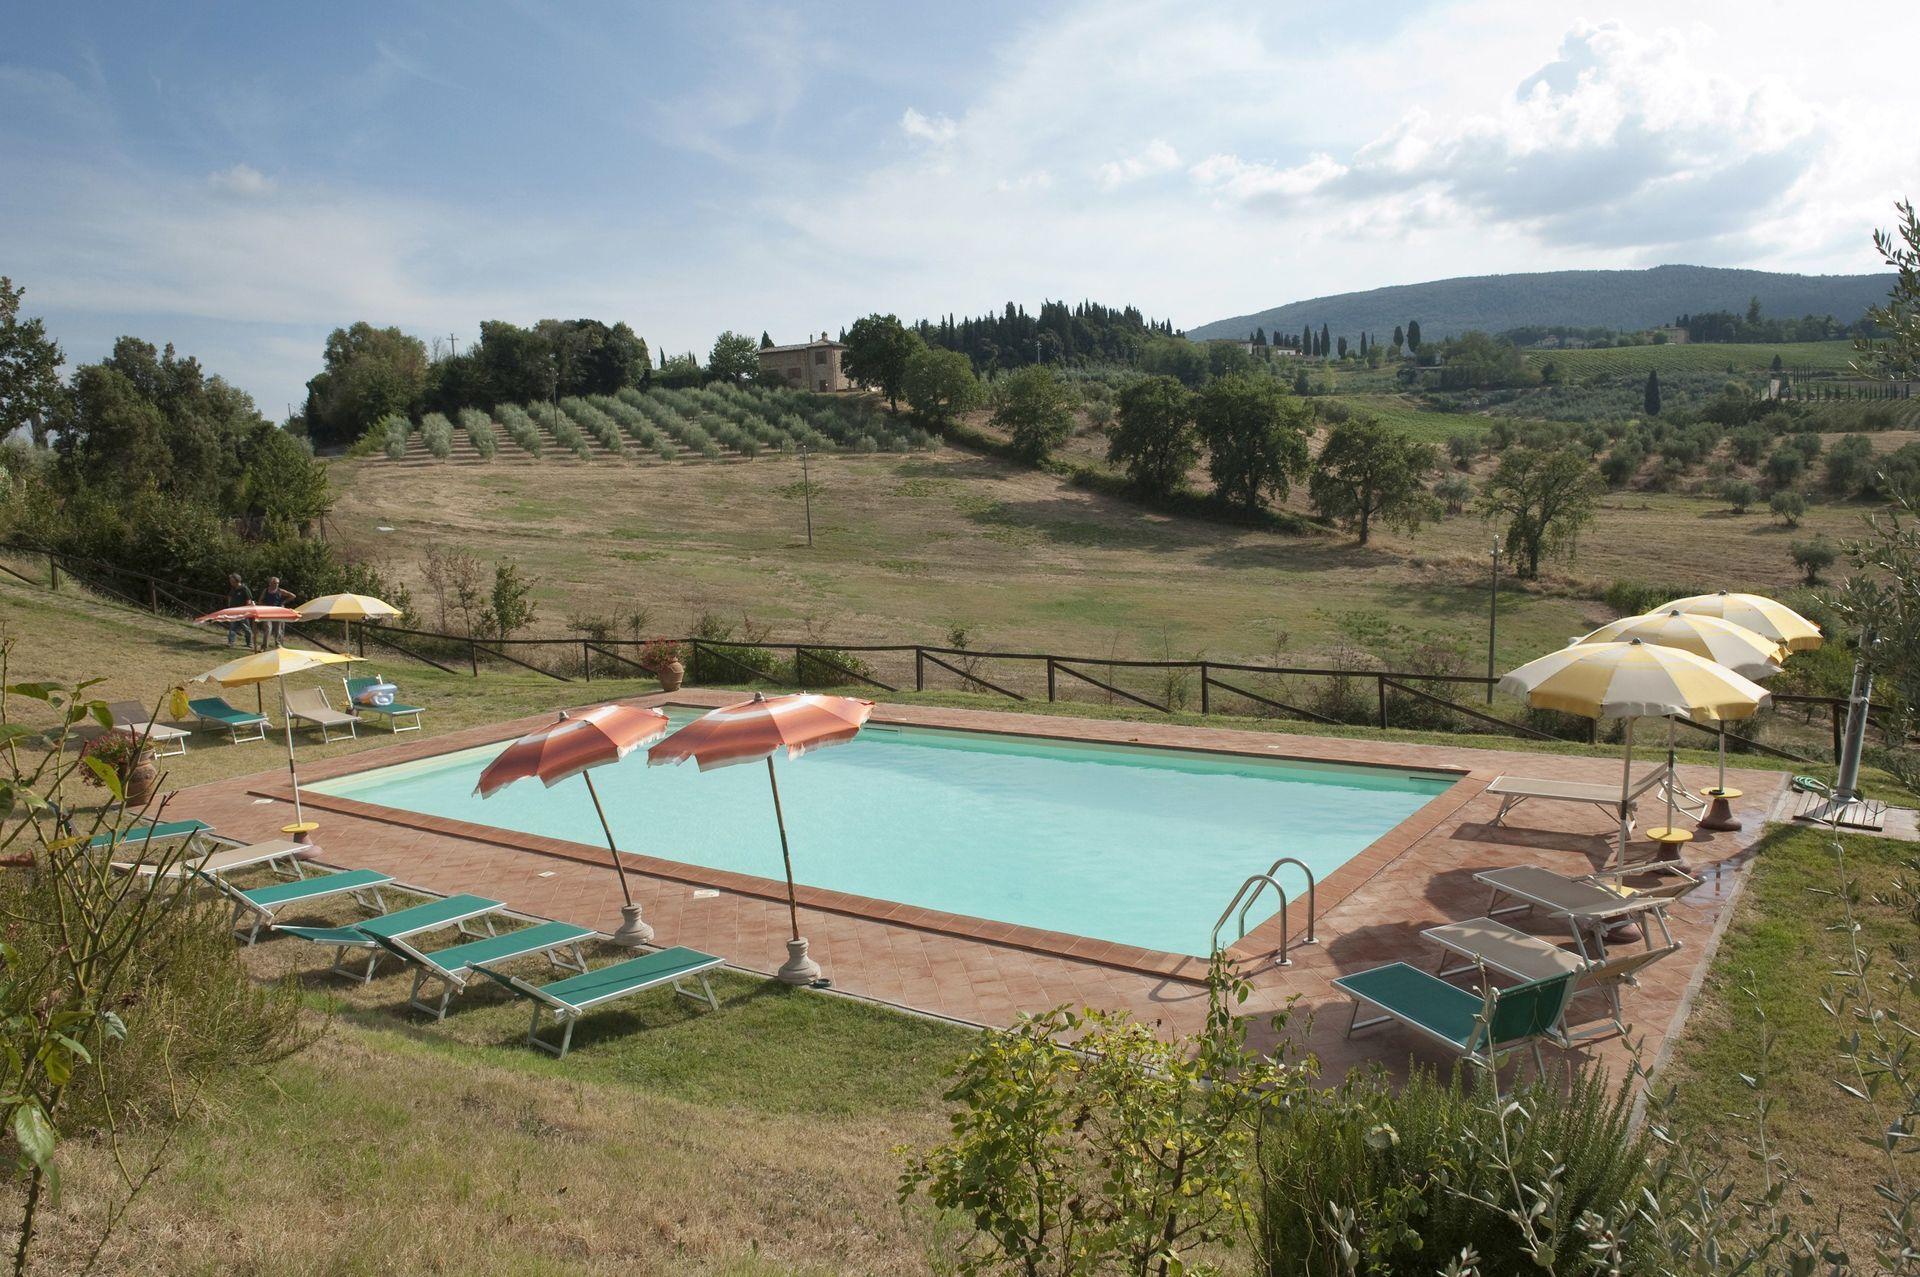 Agriturismo paterno casa vacanze con 25 posti letto in 10 camere san gimignano toscana - Agriturismo san gimignano con piscina ...